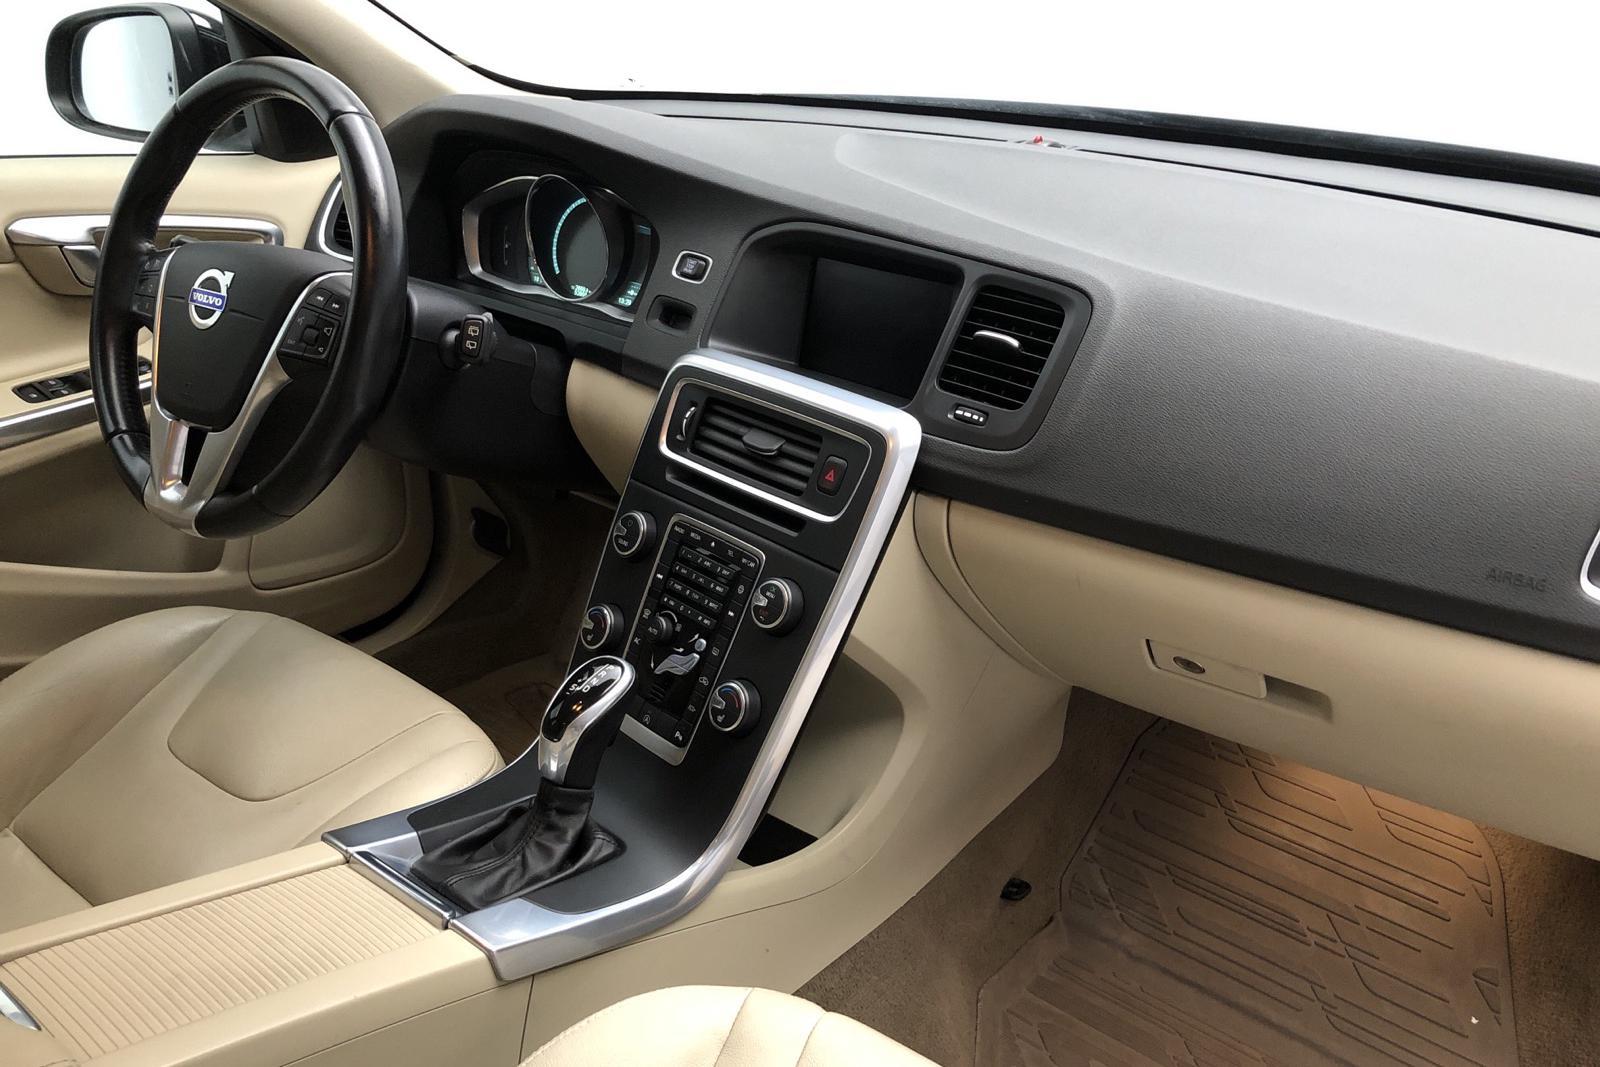 Volvo V60 D4 (181hk) - 52 860 km - Automatic - black - 2014